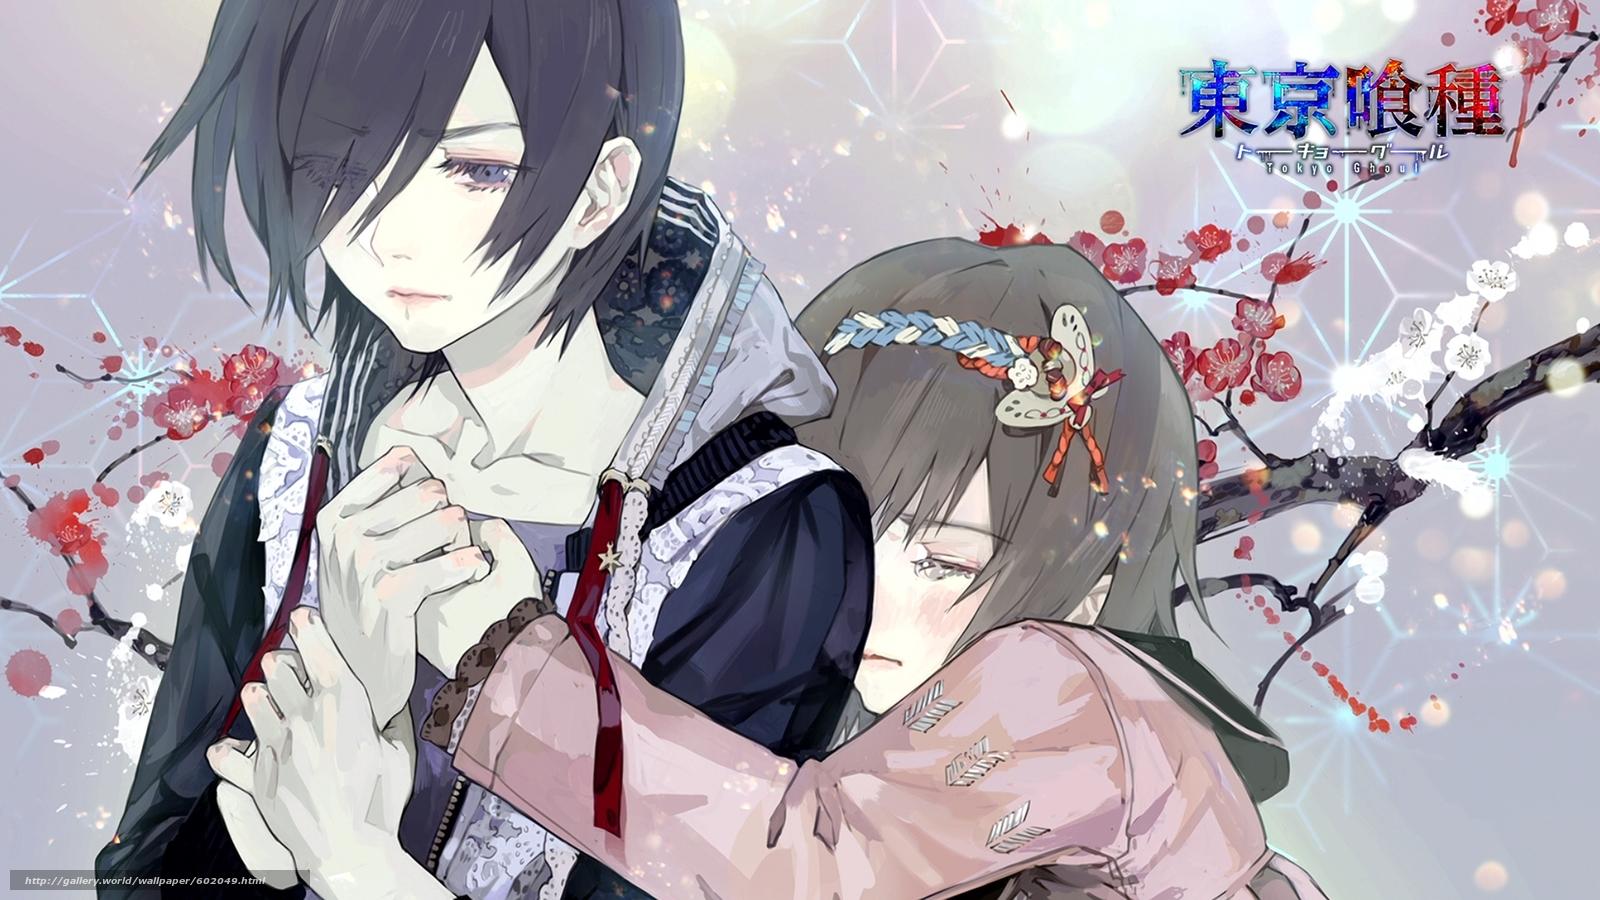 Download wallpaper anime,  Tokyo ghoul,  despair free desktop wallpaper in the resolution 1920x1080 — picture №602049